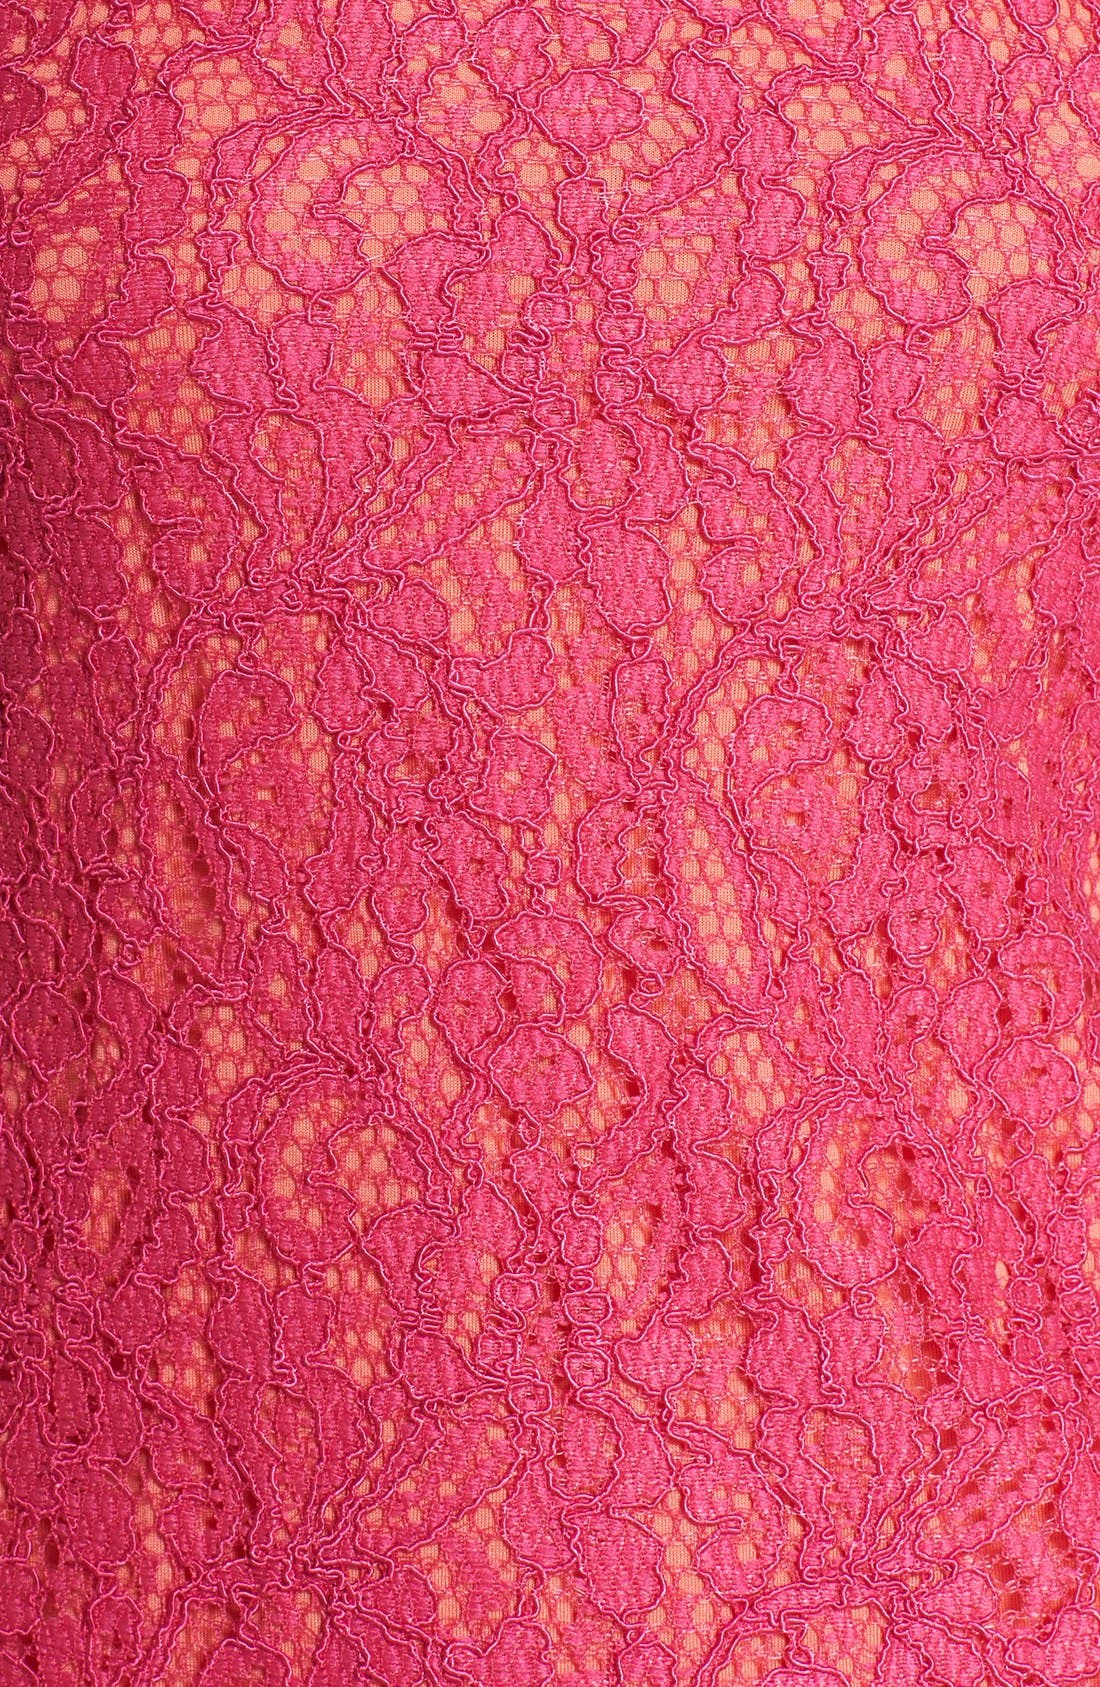 Boatneck Lace Sheath Dress,                             Alternate thumbnail 136, color,